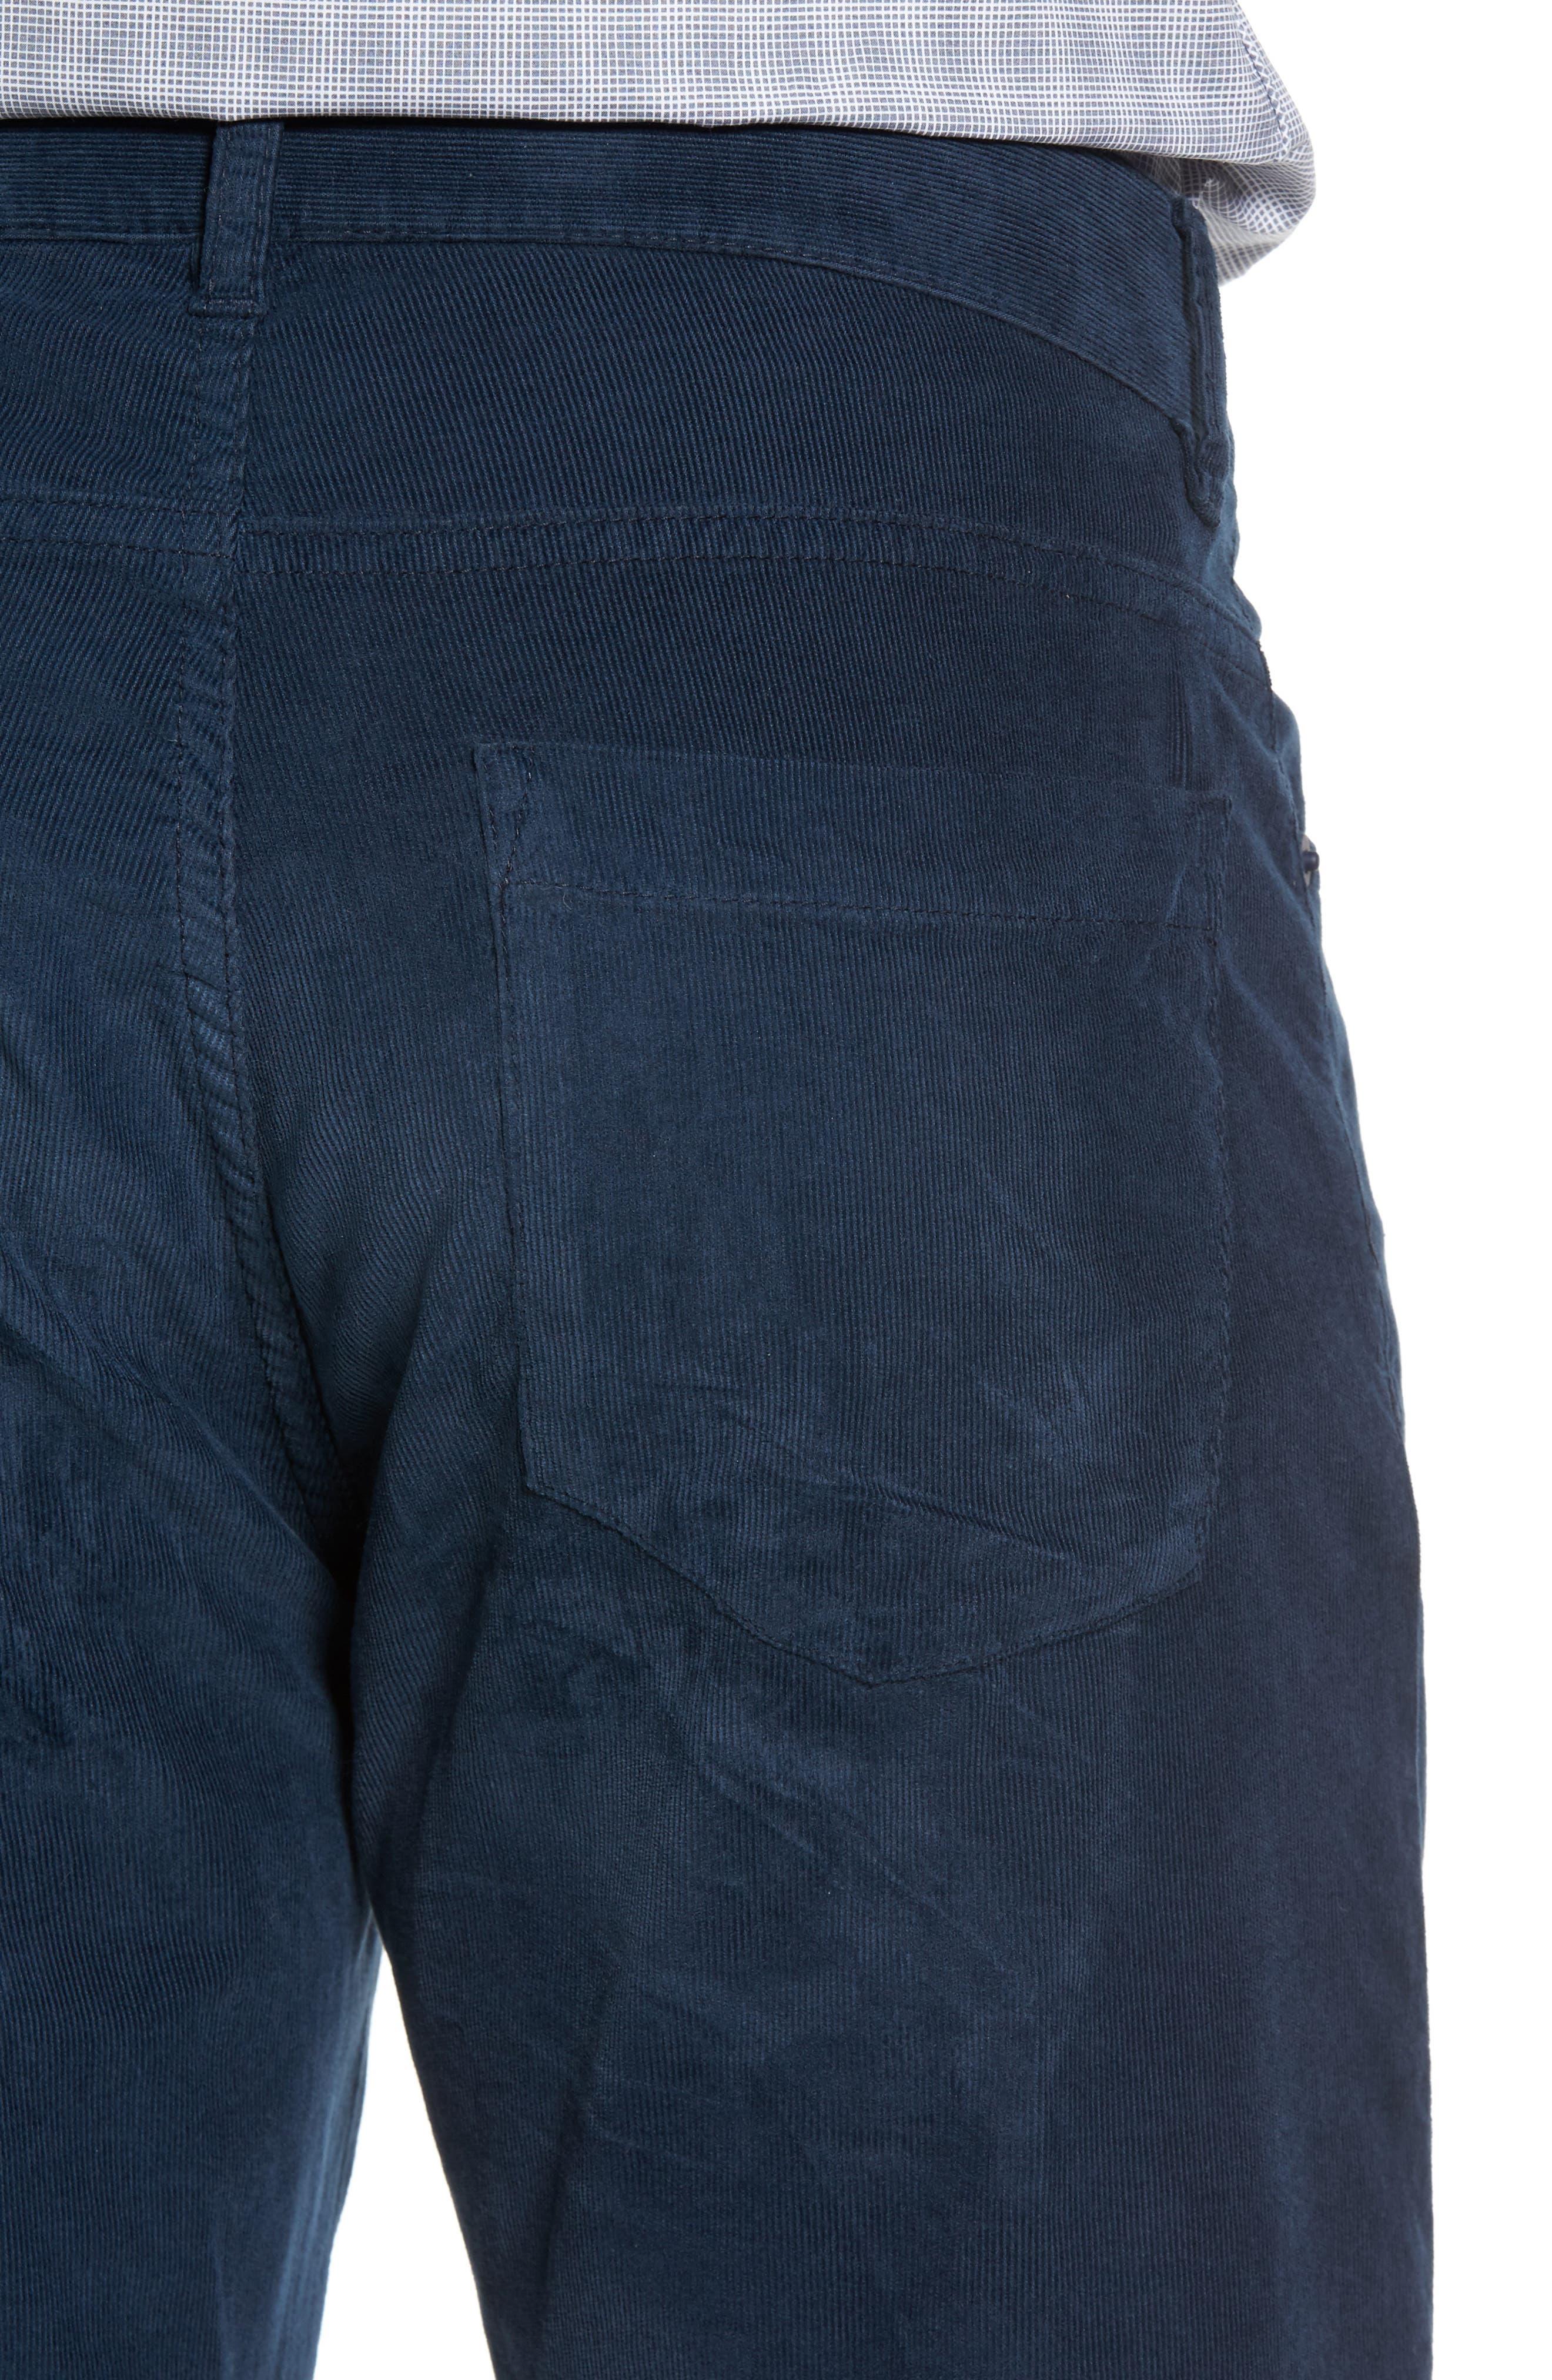 Redonda Stretch Corduroy Trousers,                             Alternate thumbnail 4, color,                             Midnight